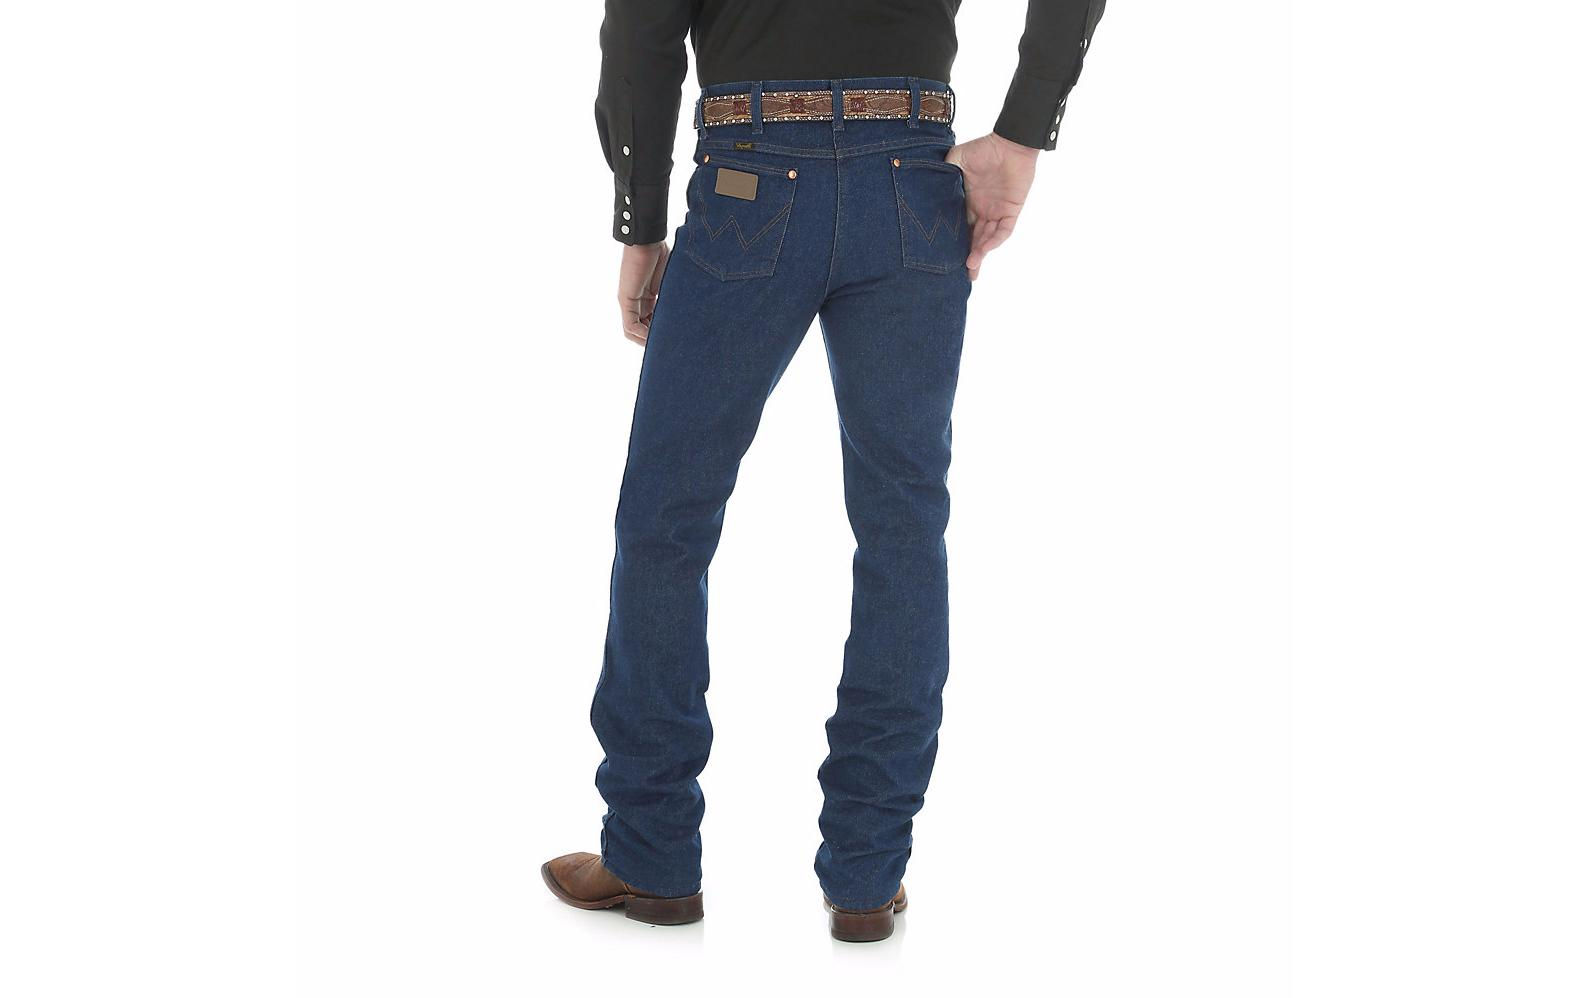 New Cut Slim Men's Sizes Denim